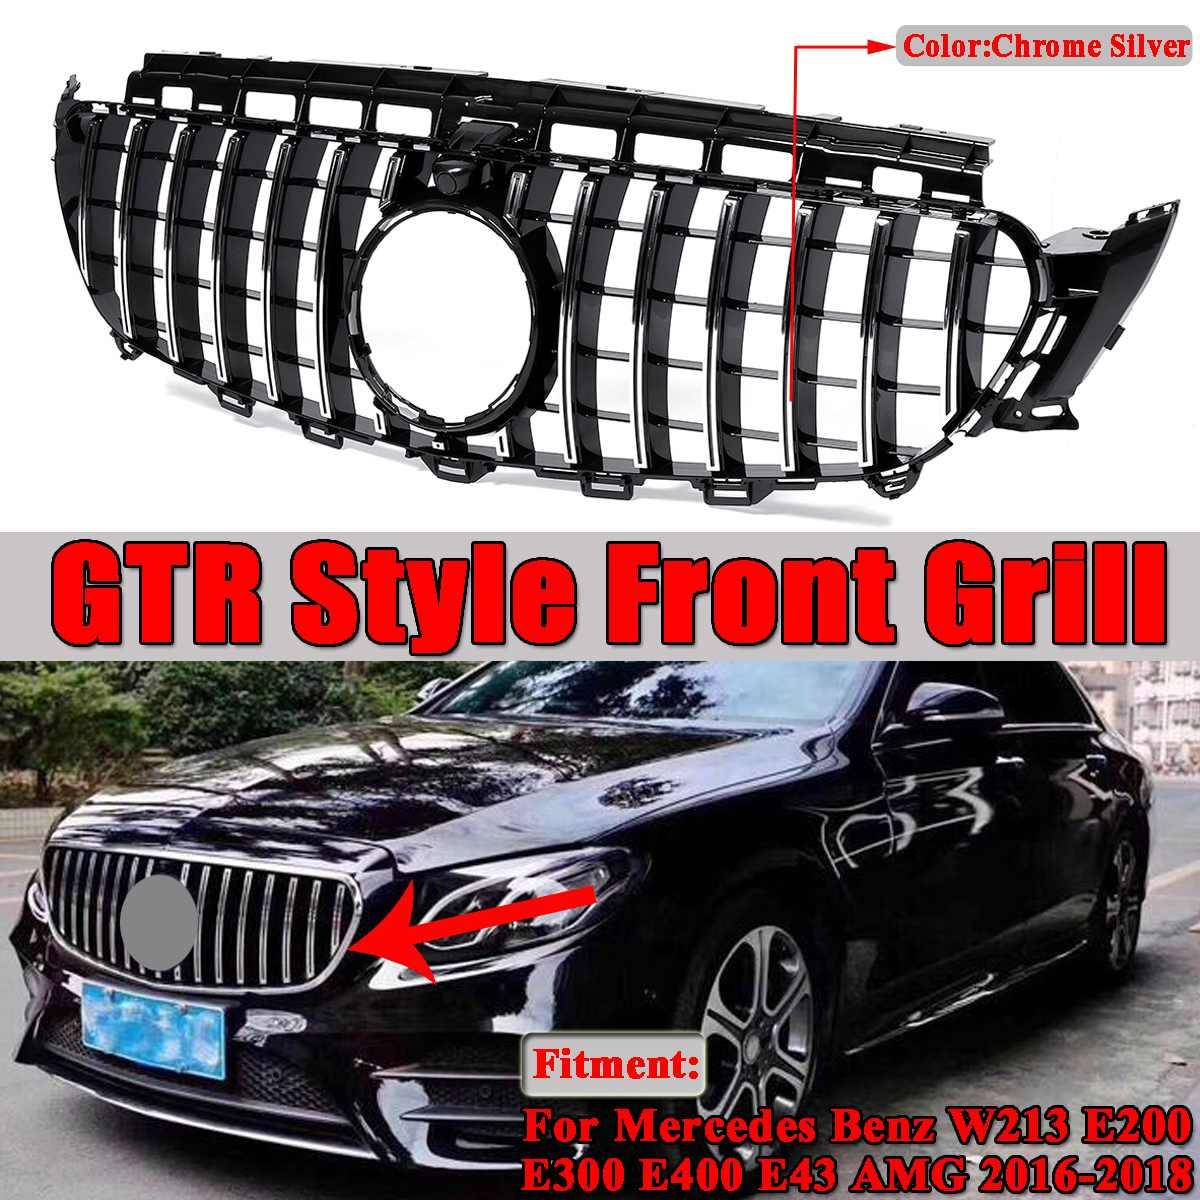 1x GT R/ダイヤモンドスタイル W213 Grlil 車のメルセデスベンツ W213 E200 E300 E400 E43 amg 2016 2017 2018 2019